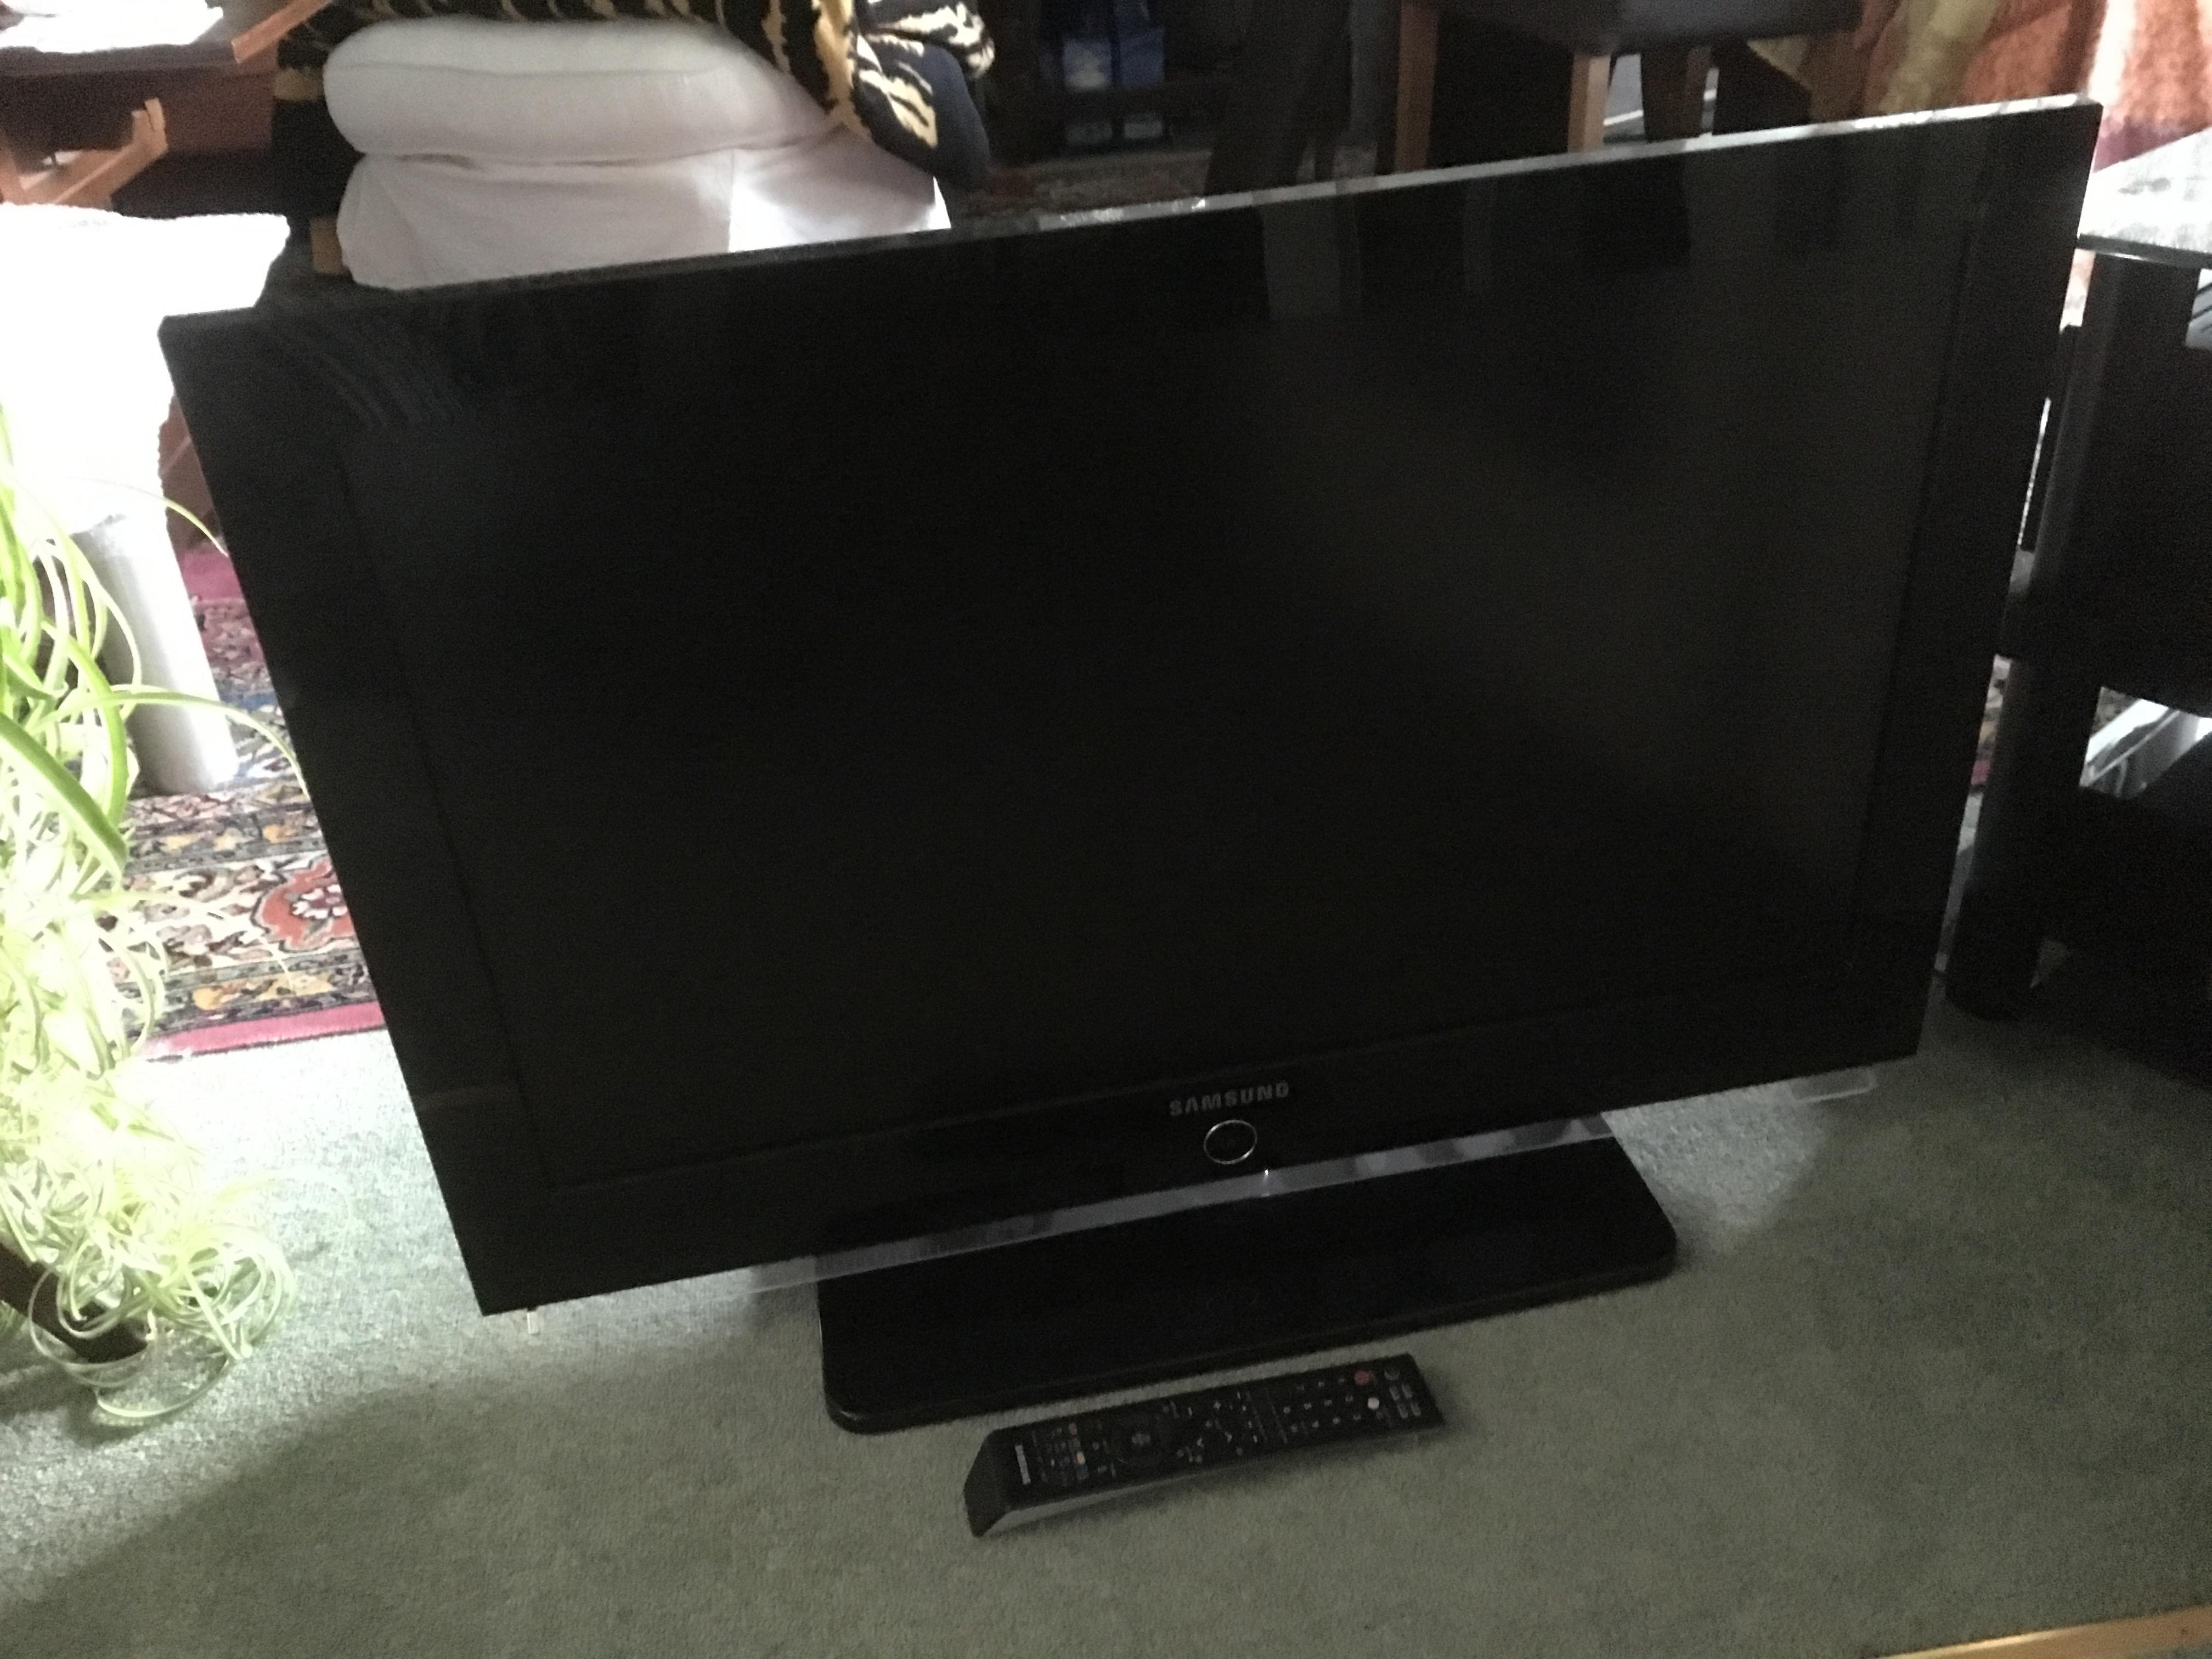 SAMSUNG flatscreen 32 inch tv,HD ready digital freeview LCD